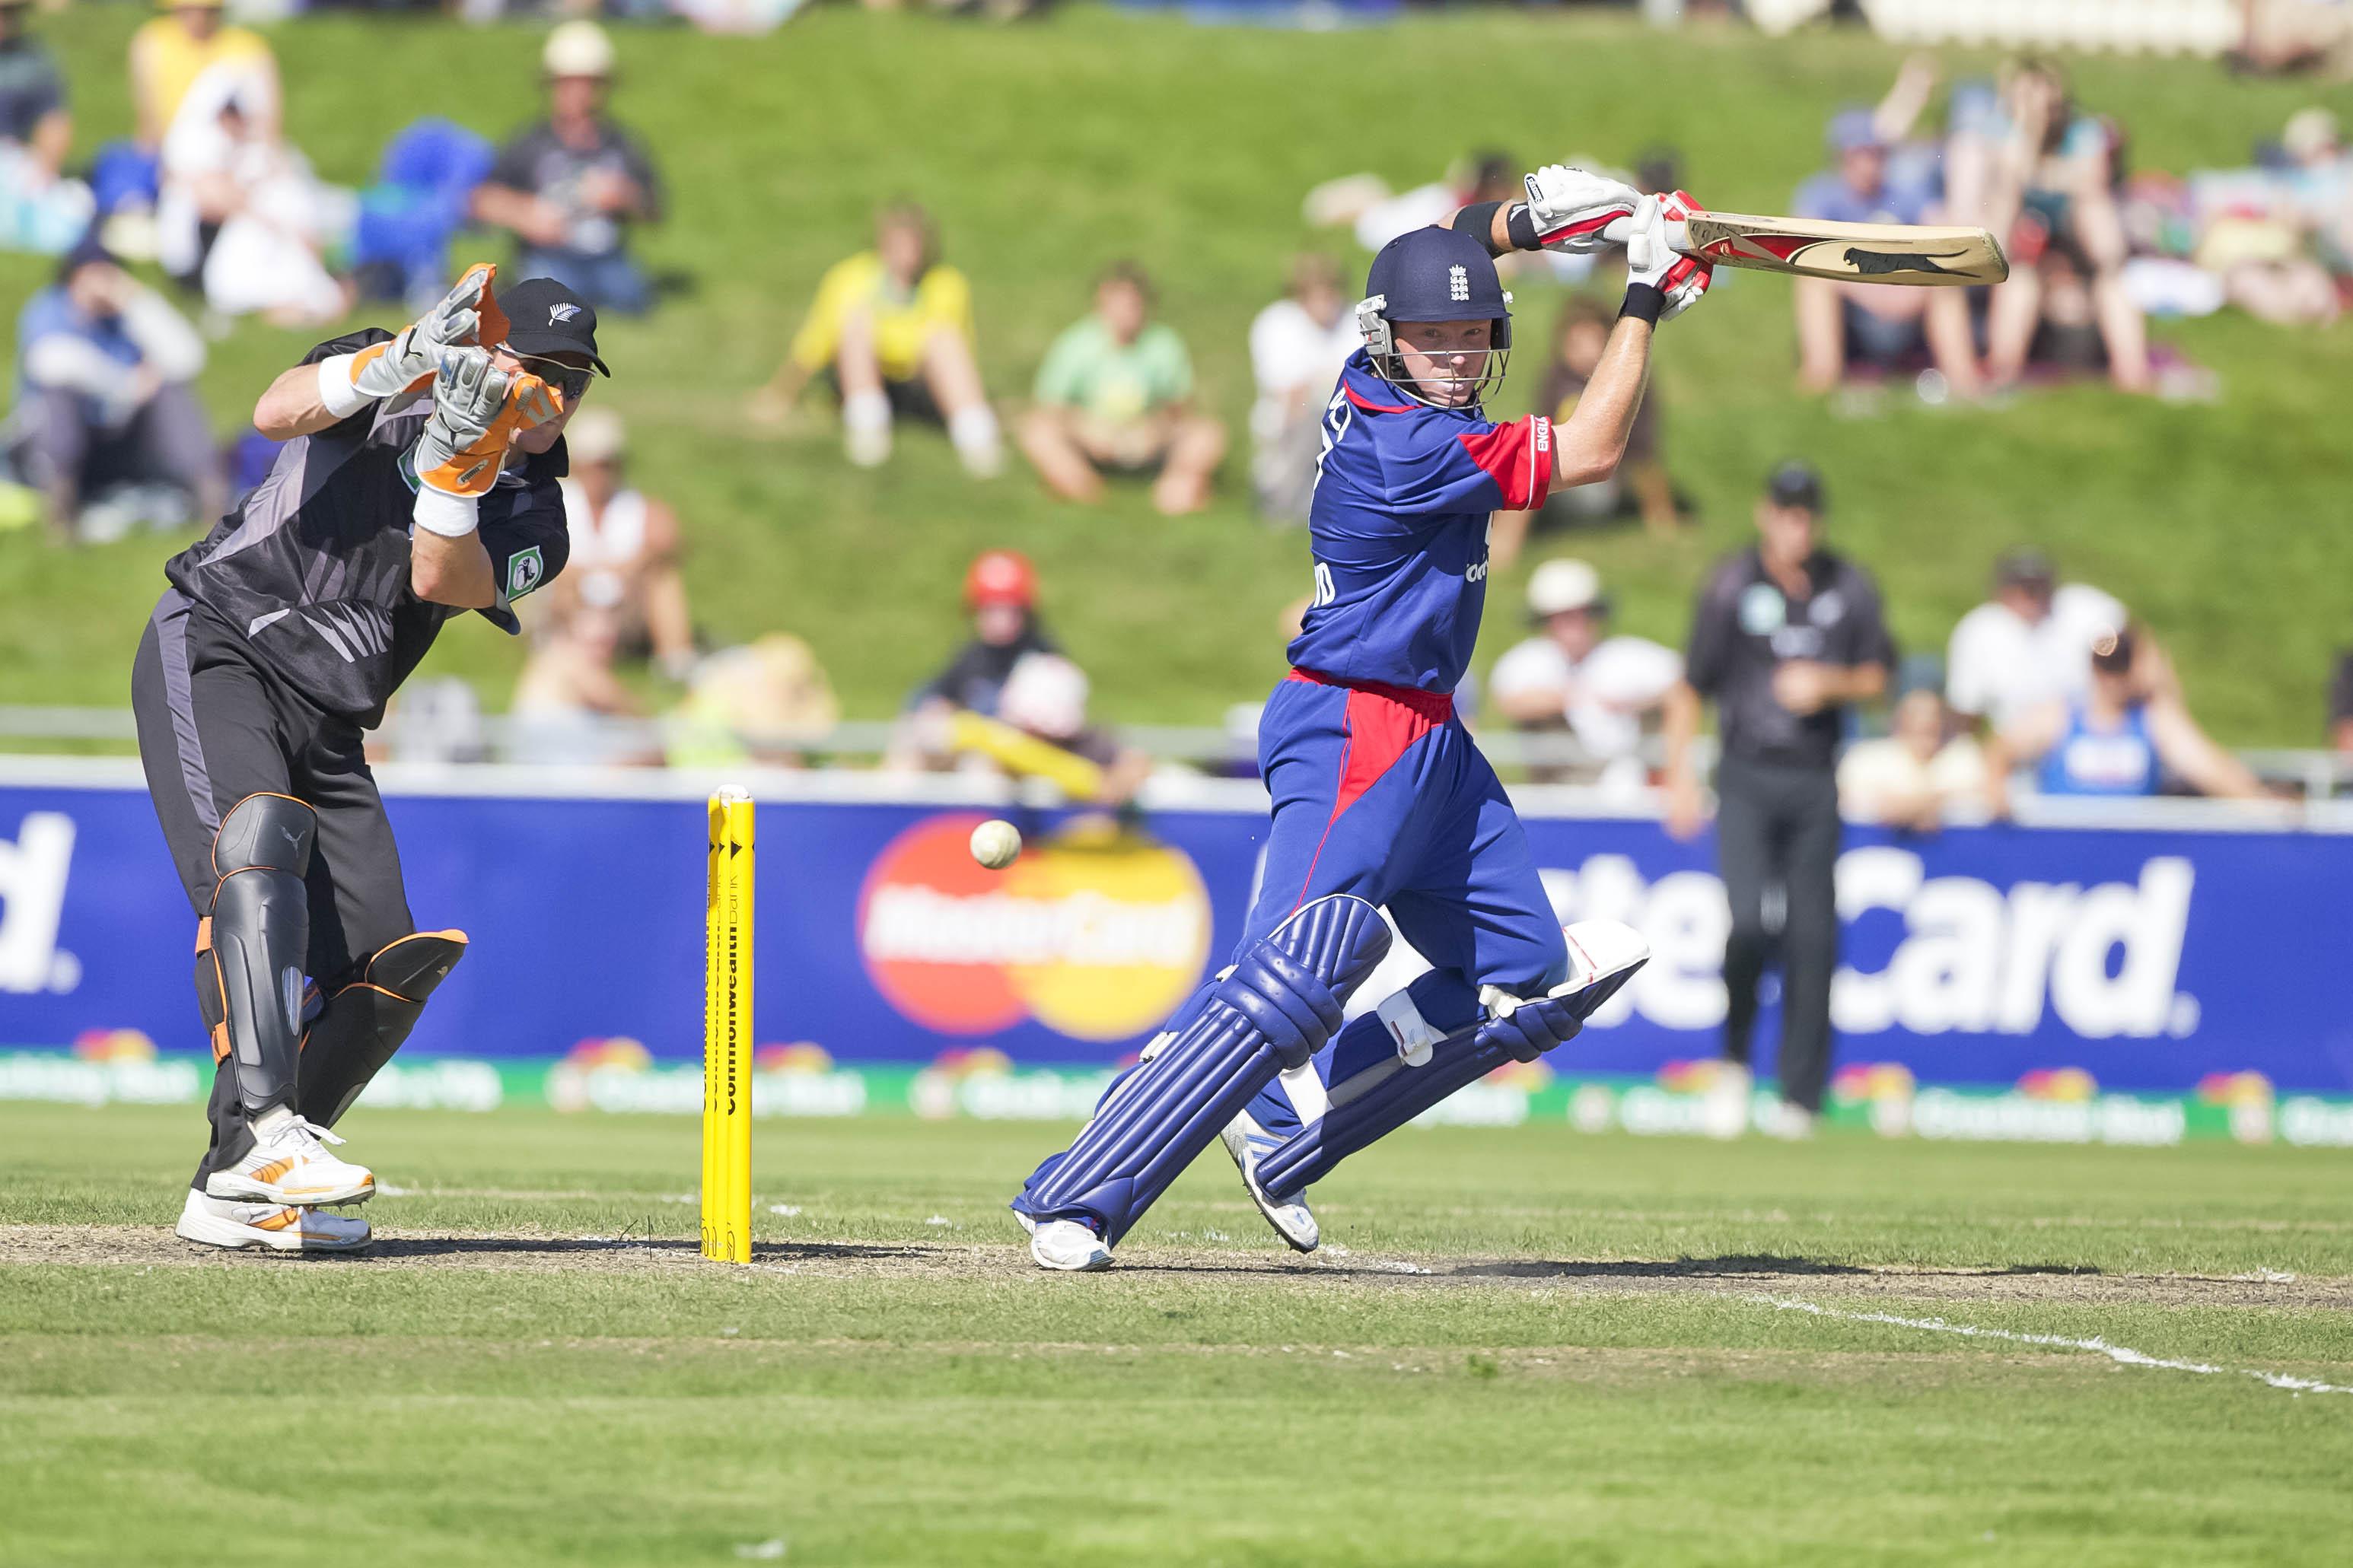 16.1.7_cricket_England tour of Australia 2006/7_England v New Zealand. ODI, bellerive oval, hobart_ian bell cuts vettori.